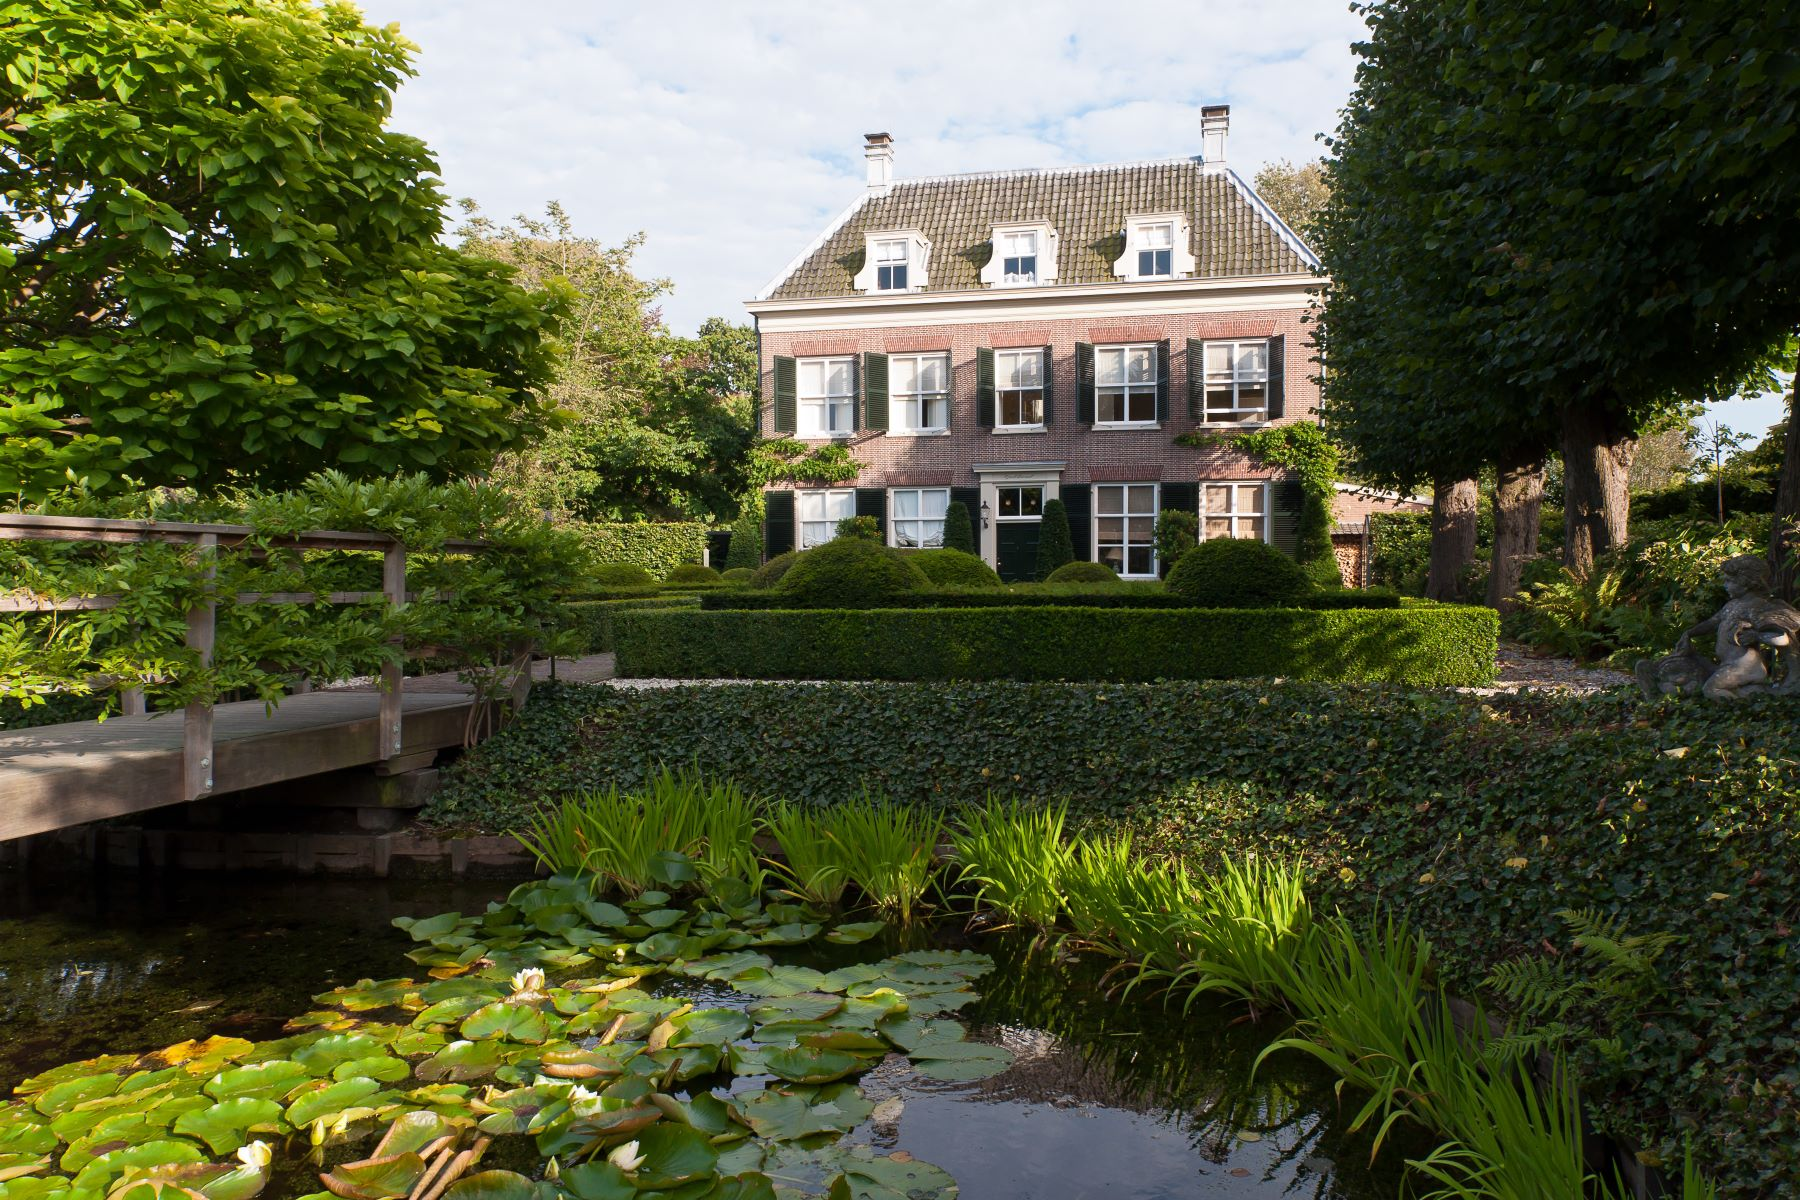 Other Residential Homes для того Продажа на Groot Leerust Warmond, South Holland Нидерланды